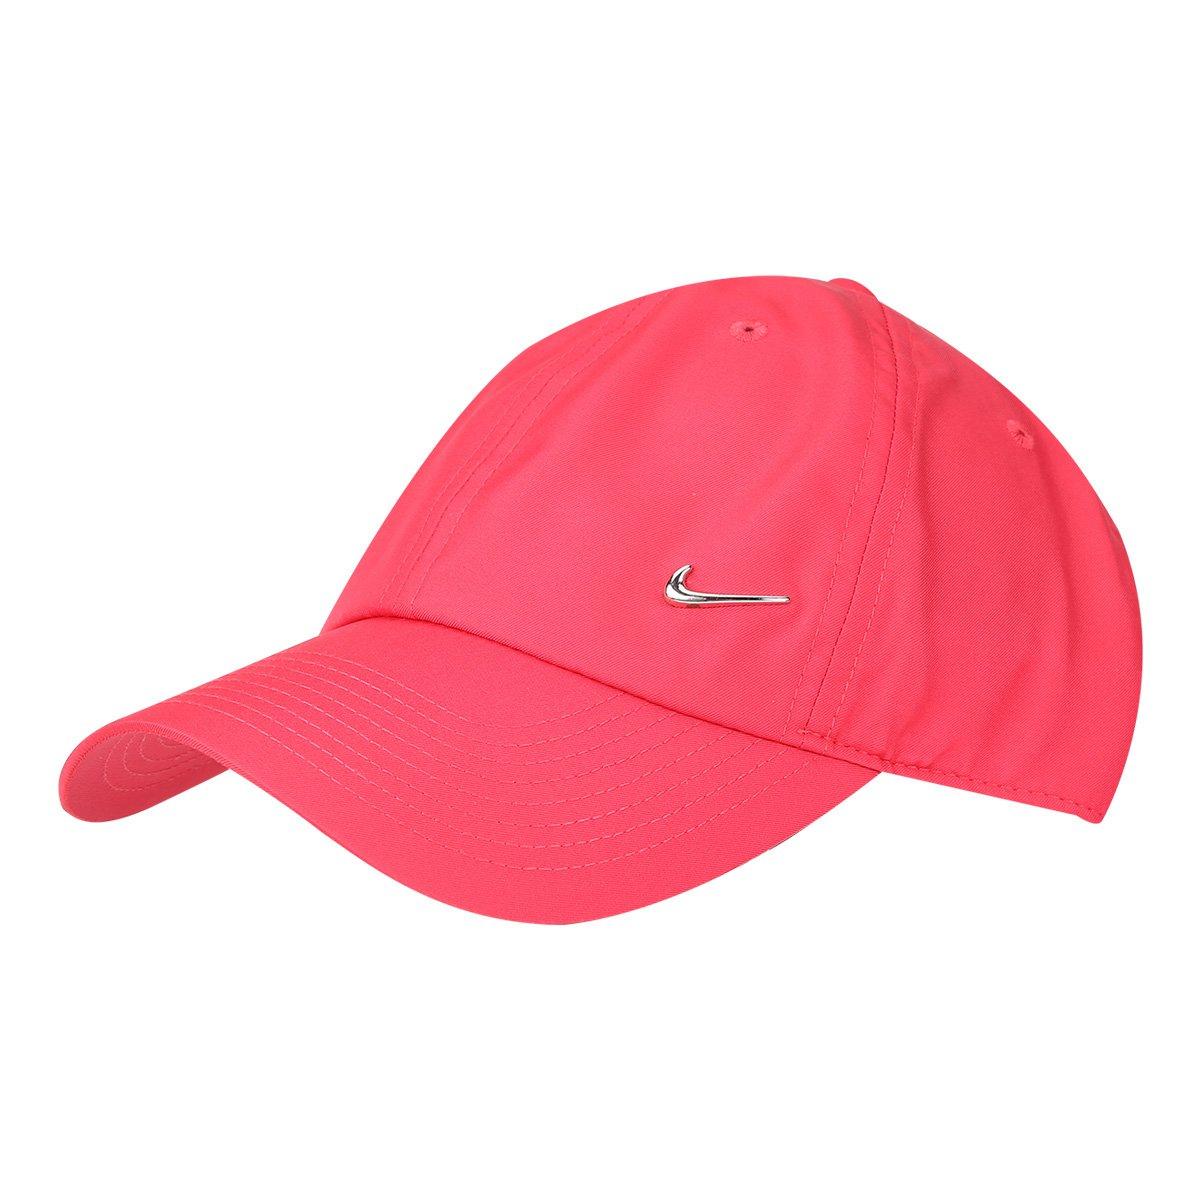 Boné Nike Aba Curva H86 Metal Swoosh - Pink - Compre Agora  511820e81db2a